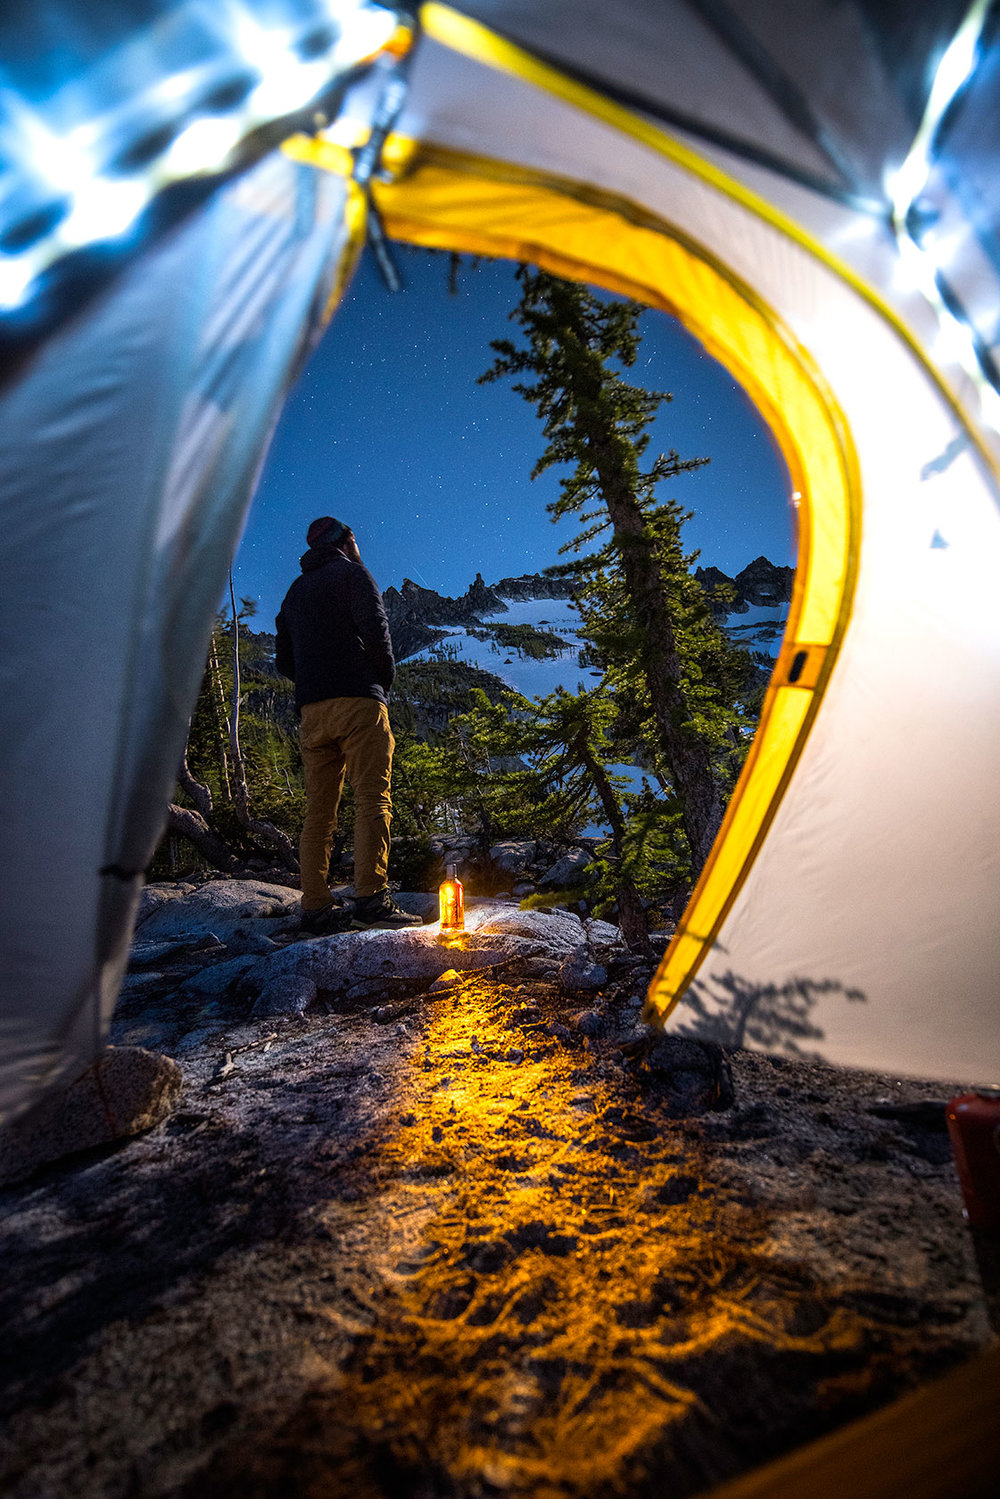 austin-trigg-whiskey-enchantments-washington-product-tent-view-night-light.jpg